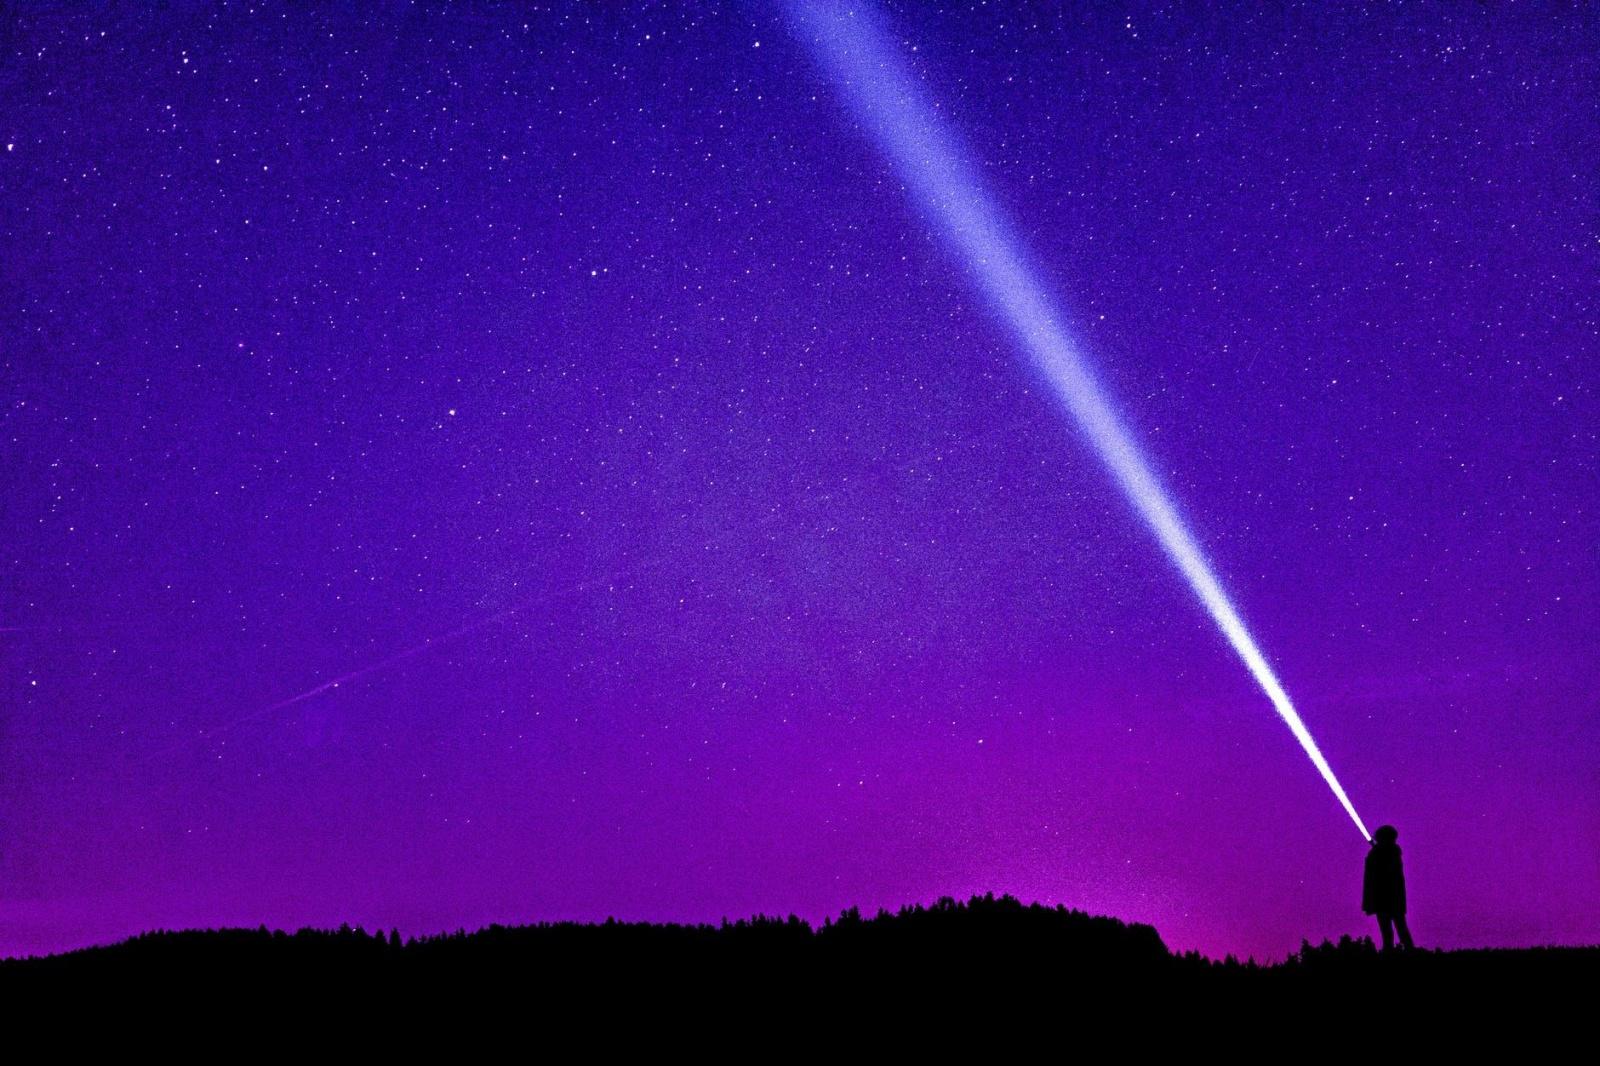 Night Photograph Starry Sky Night Sky Star 957040